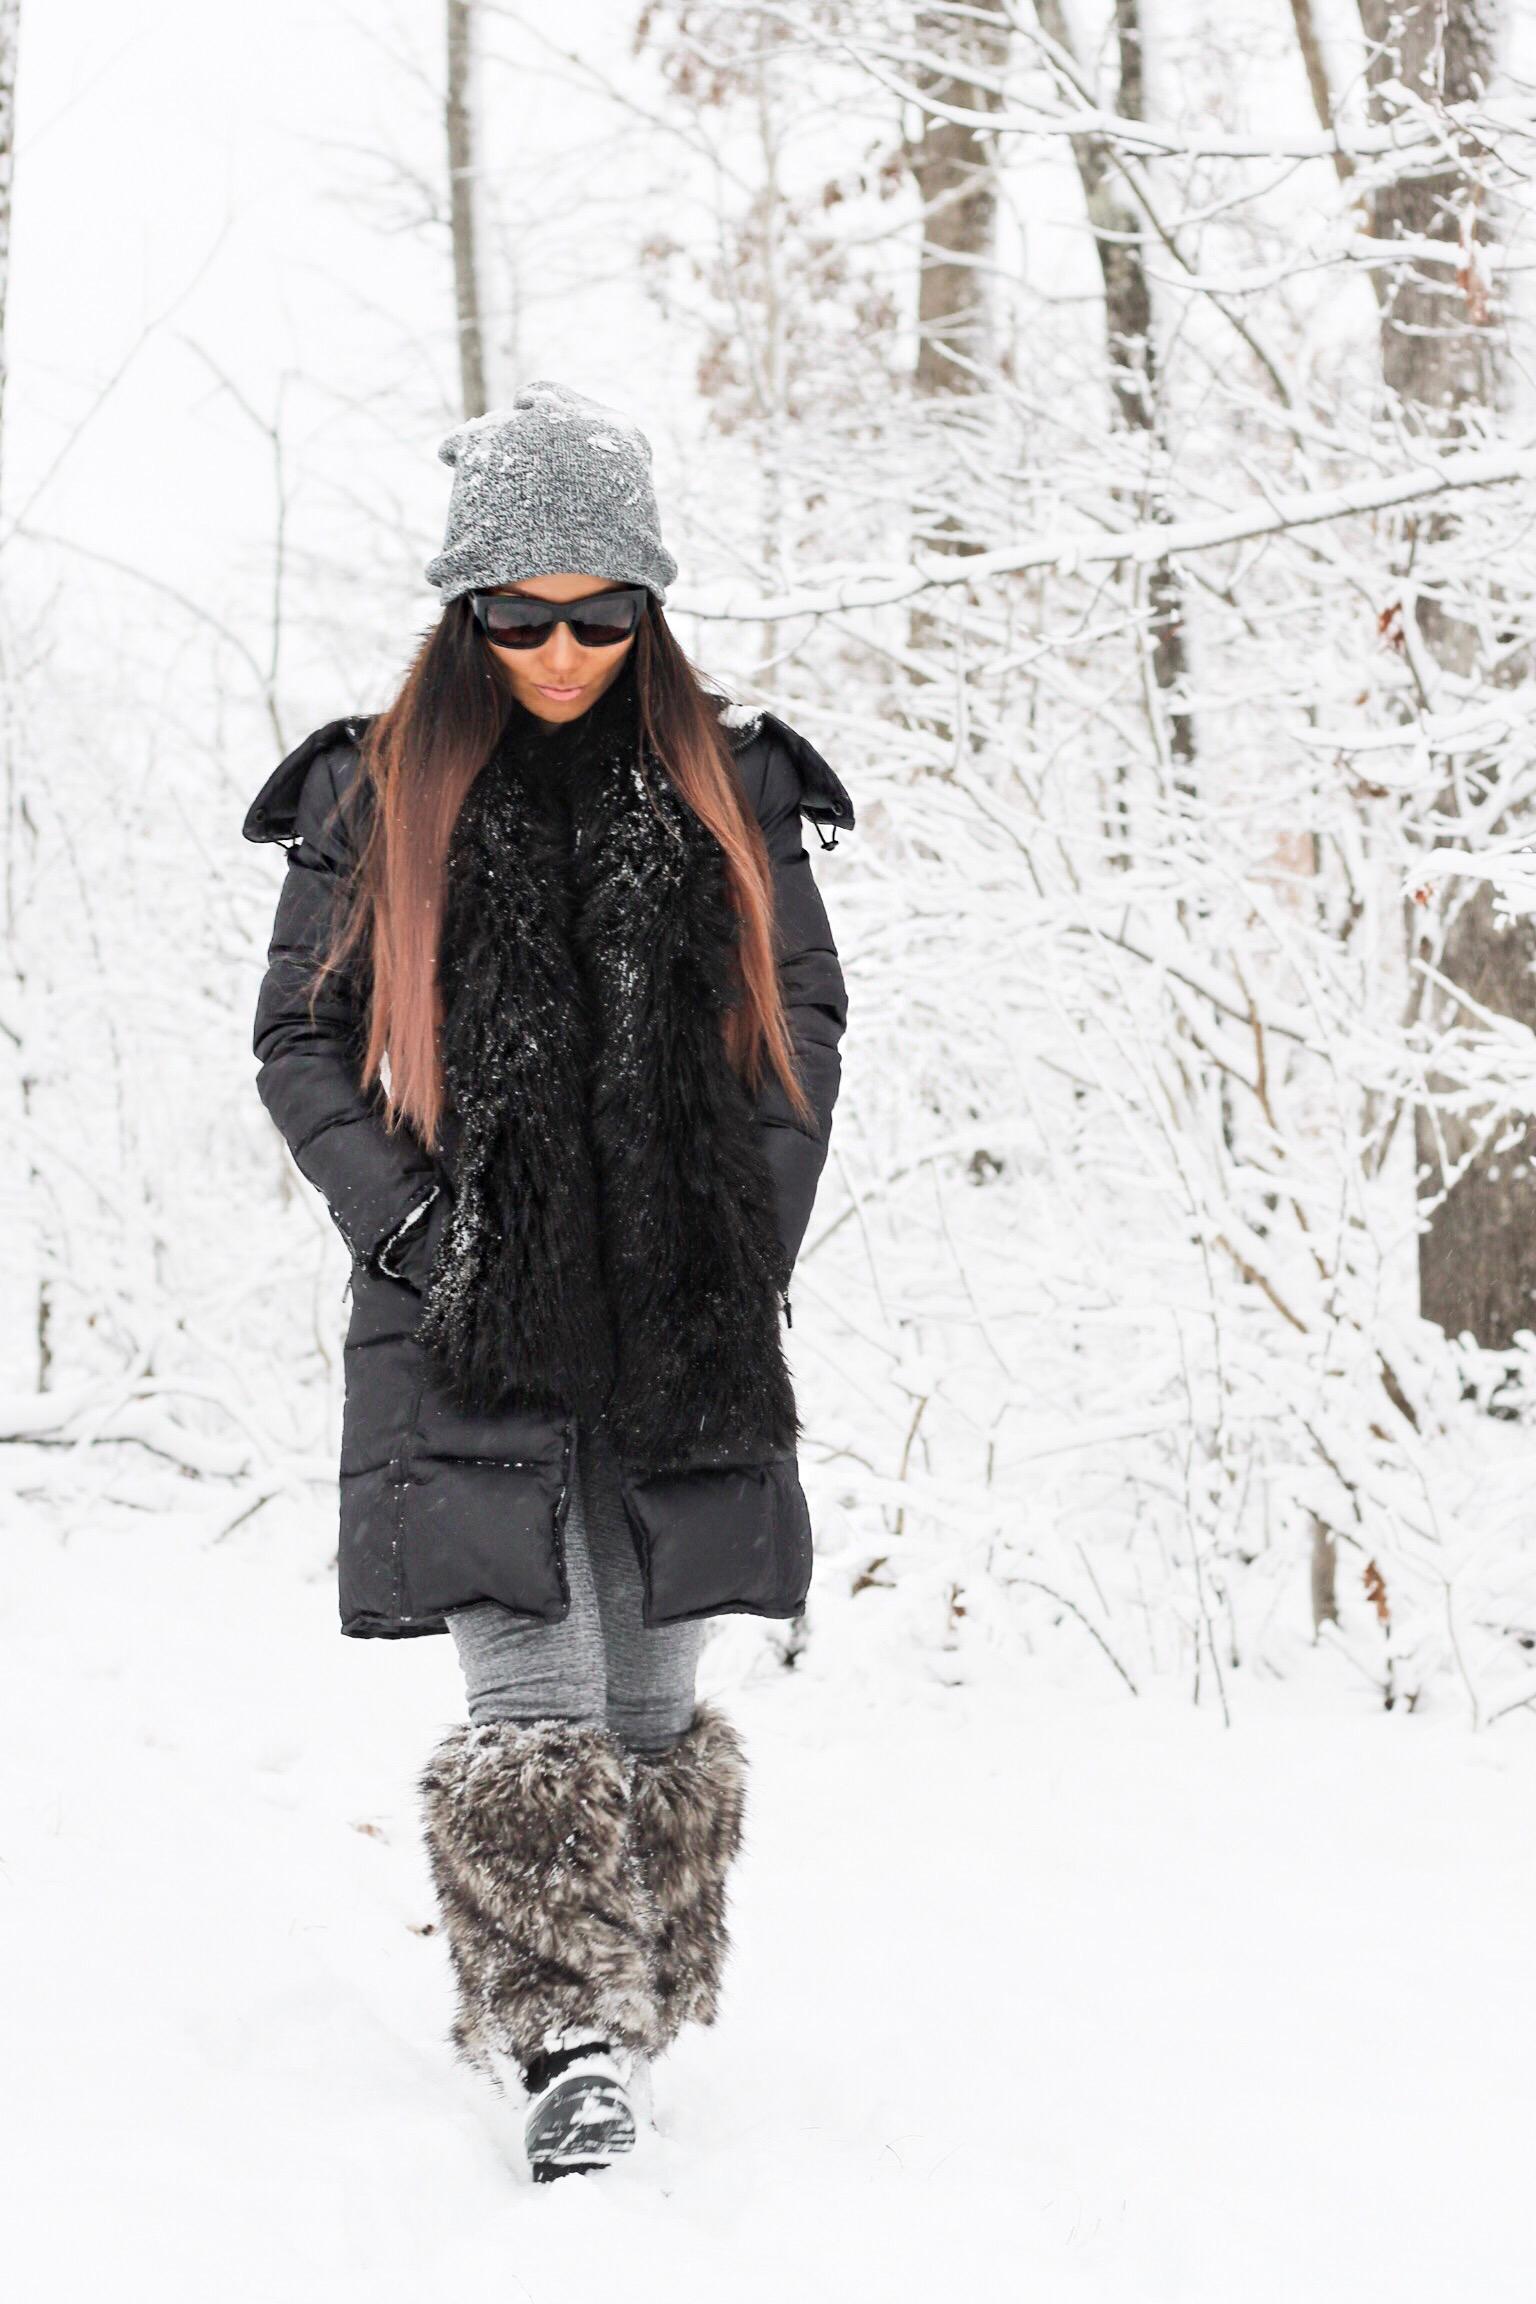 Snow gear, snow day fashion, modern mom, modern style mom, Charlotte Mom, Mom blogger, winter is here, snow gear